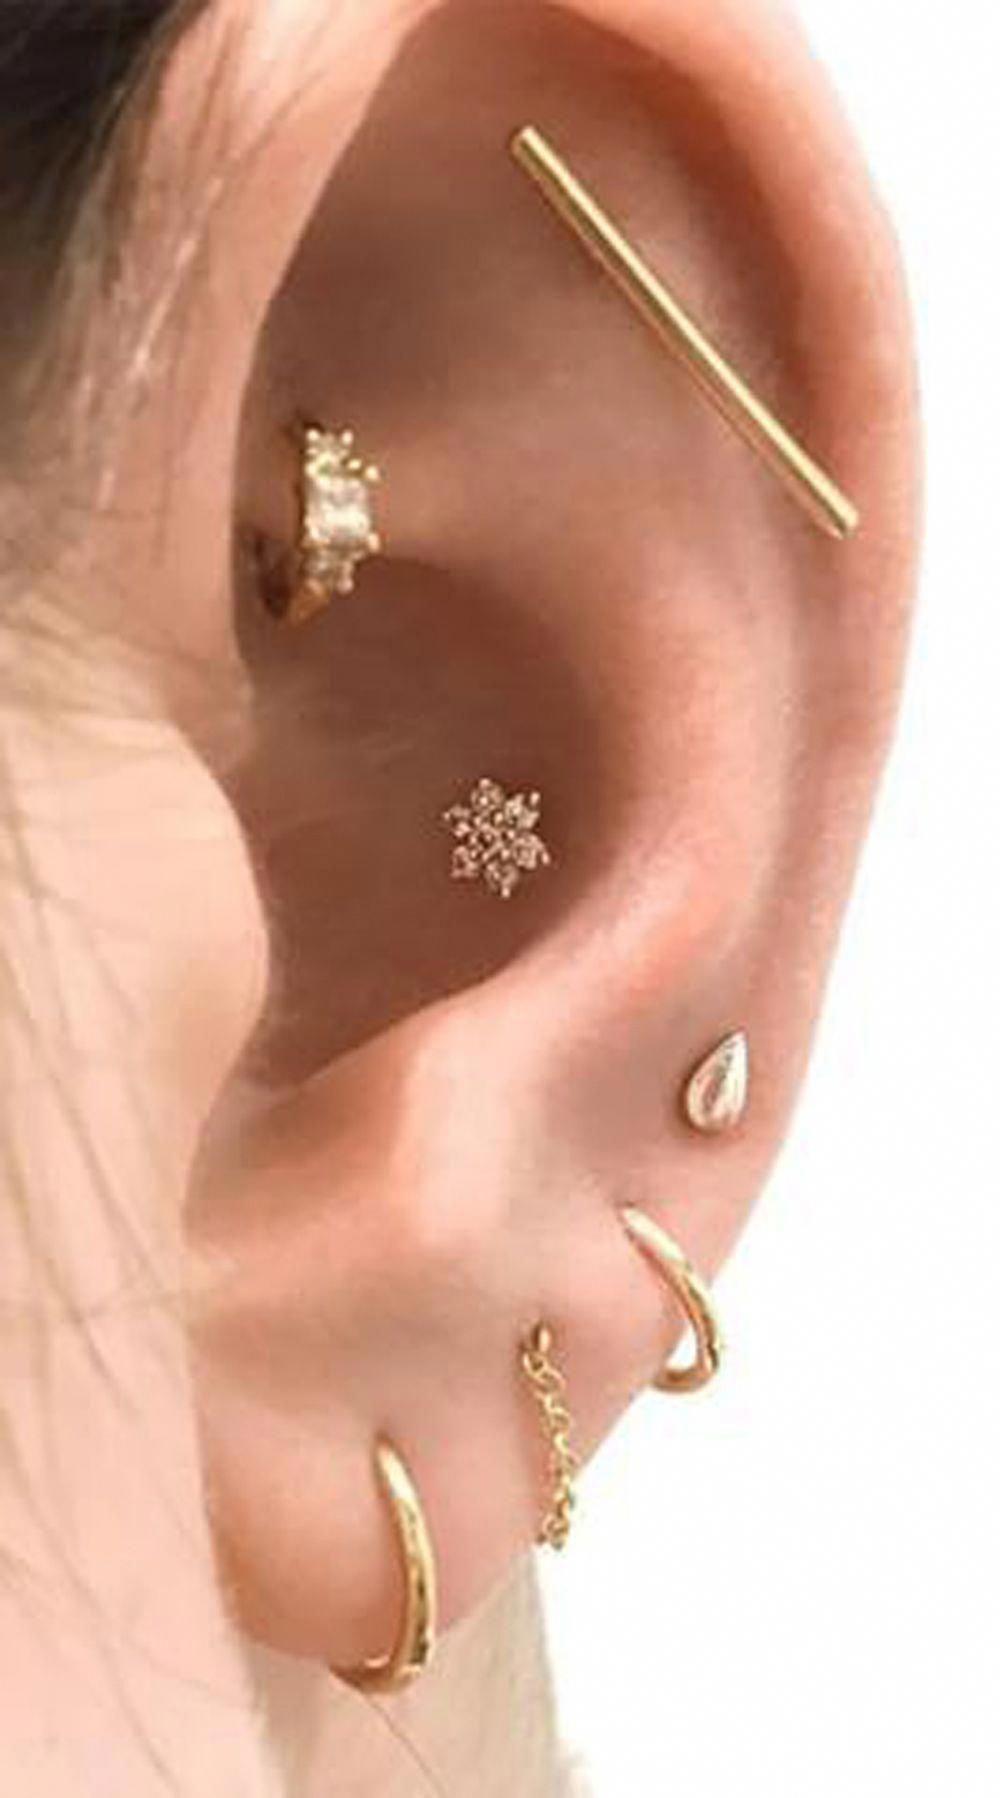 14k Yellow Gold Disk Design Heart Diamond Earrings Stud Post Studs